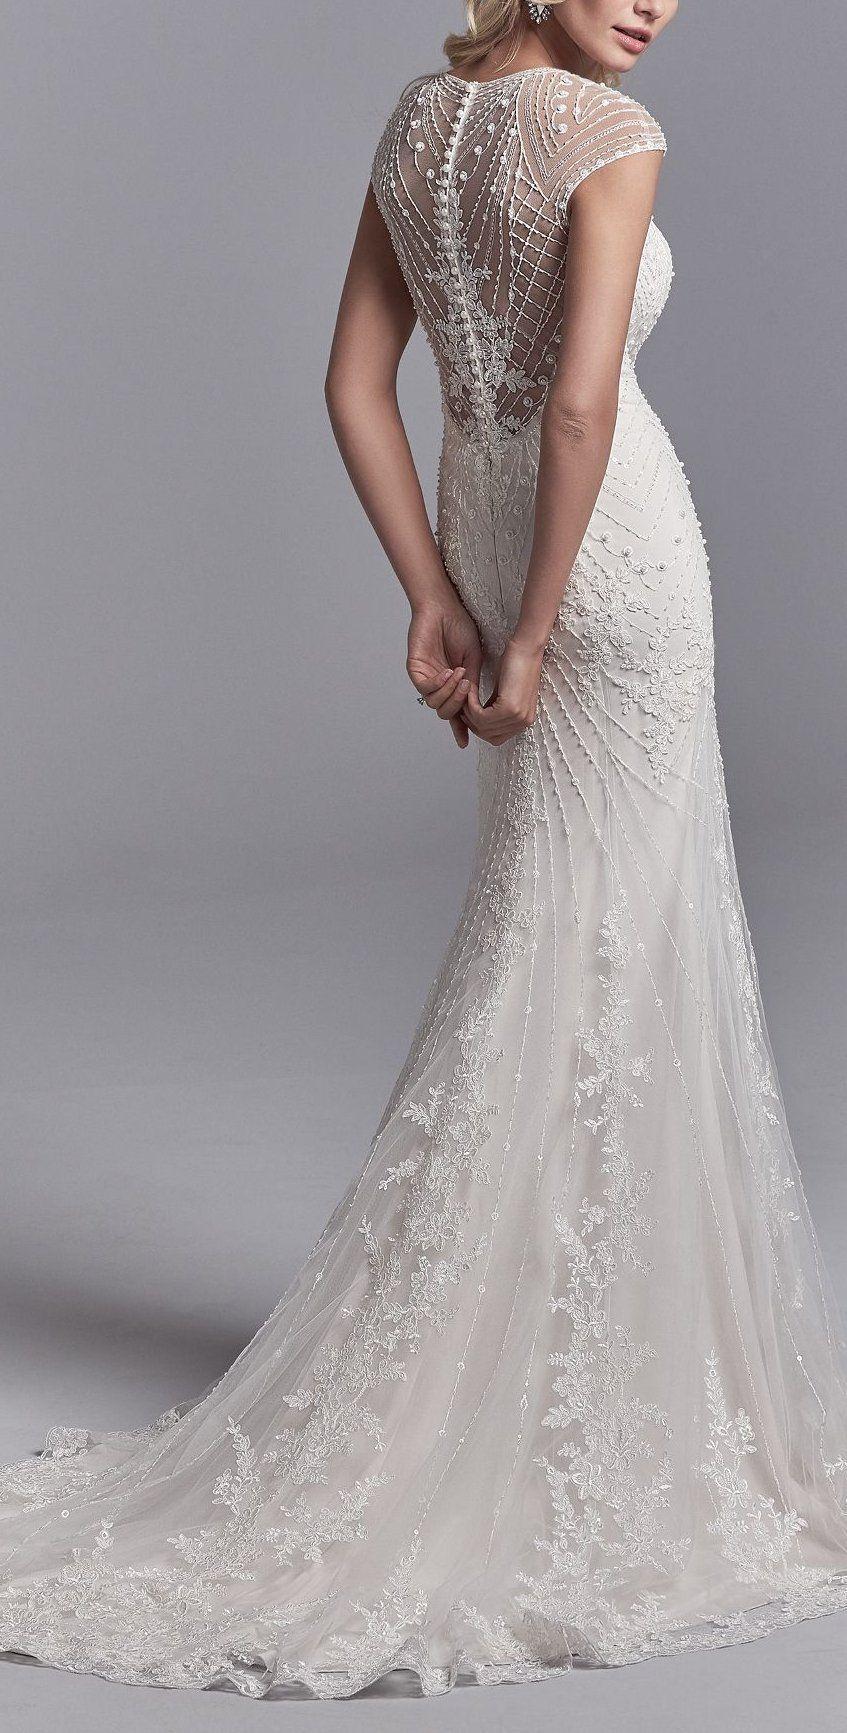 Grady By Sottero And Midgley Wedding Dresses Wedding Dresses Wedding Dress Accessories Mermaid Wedding Dress